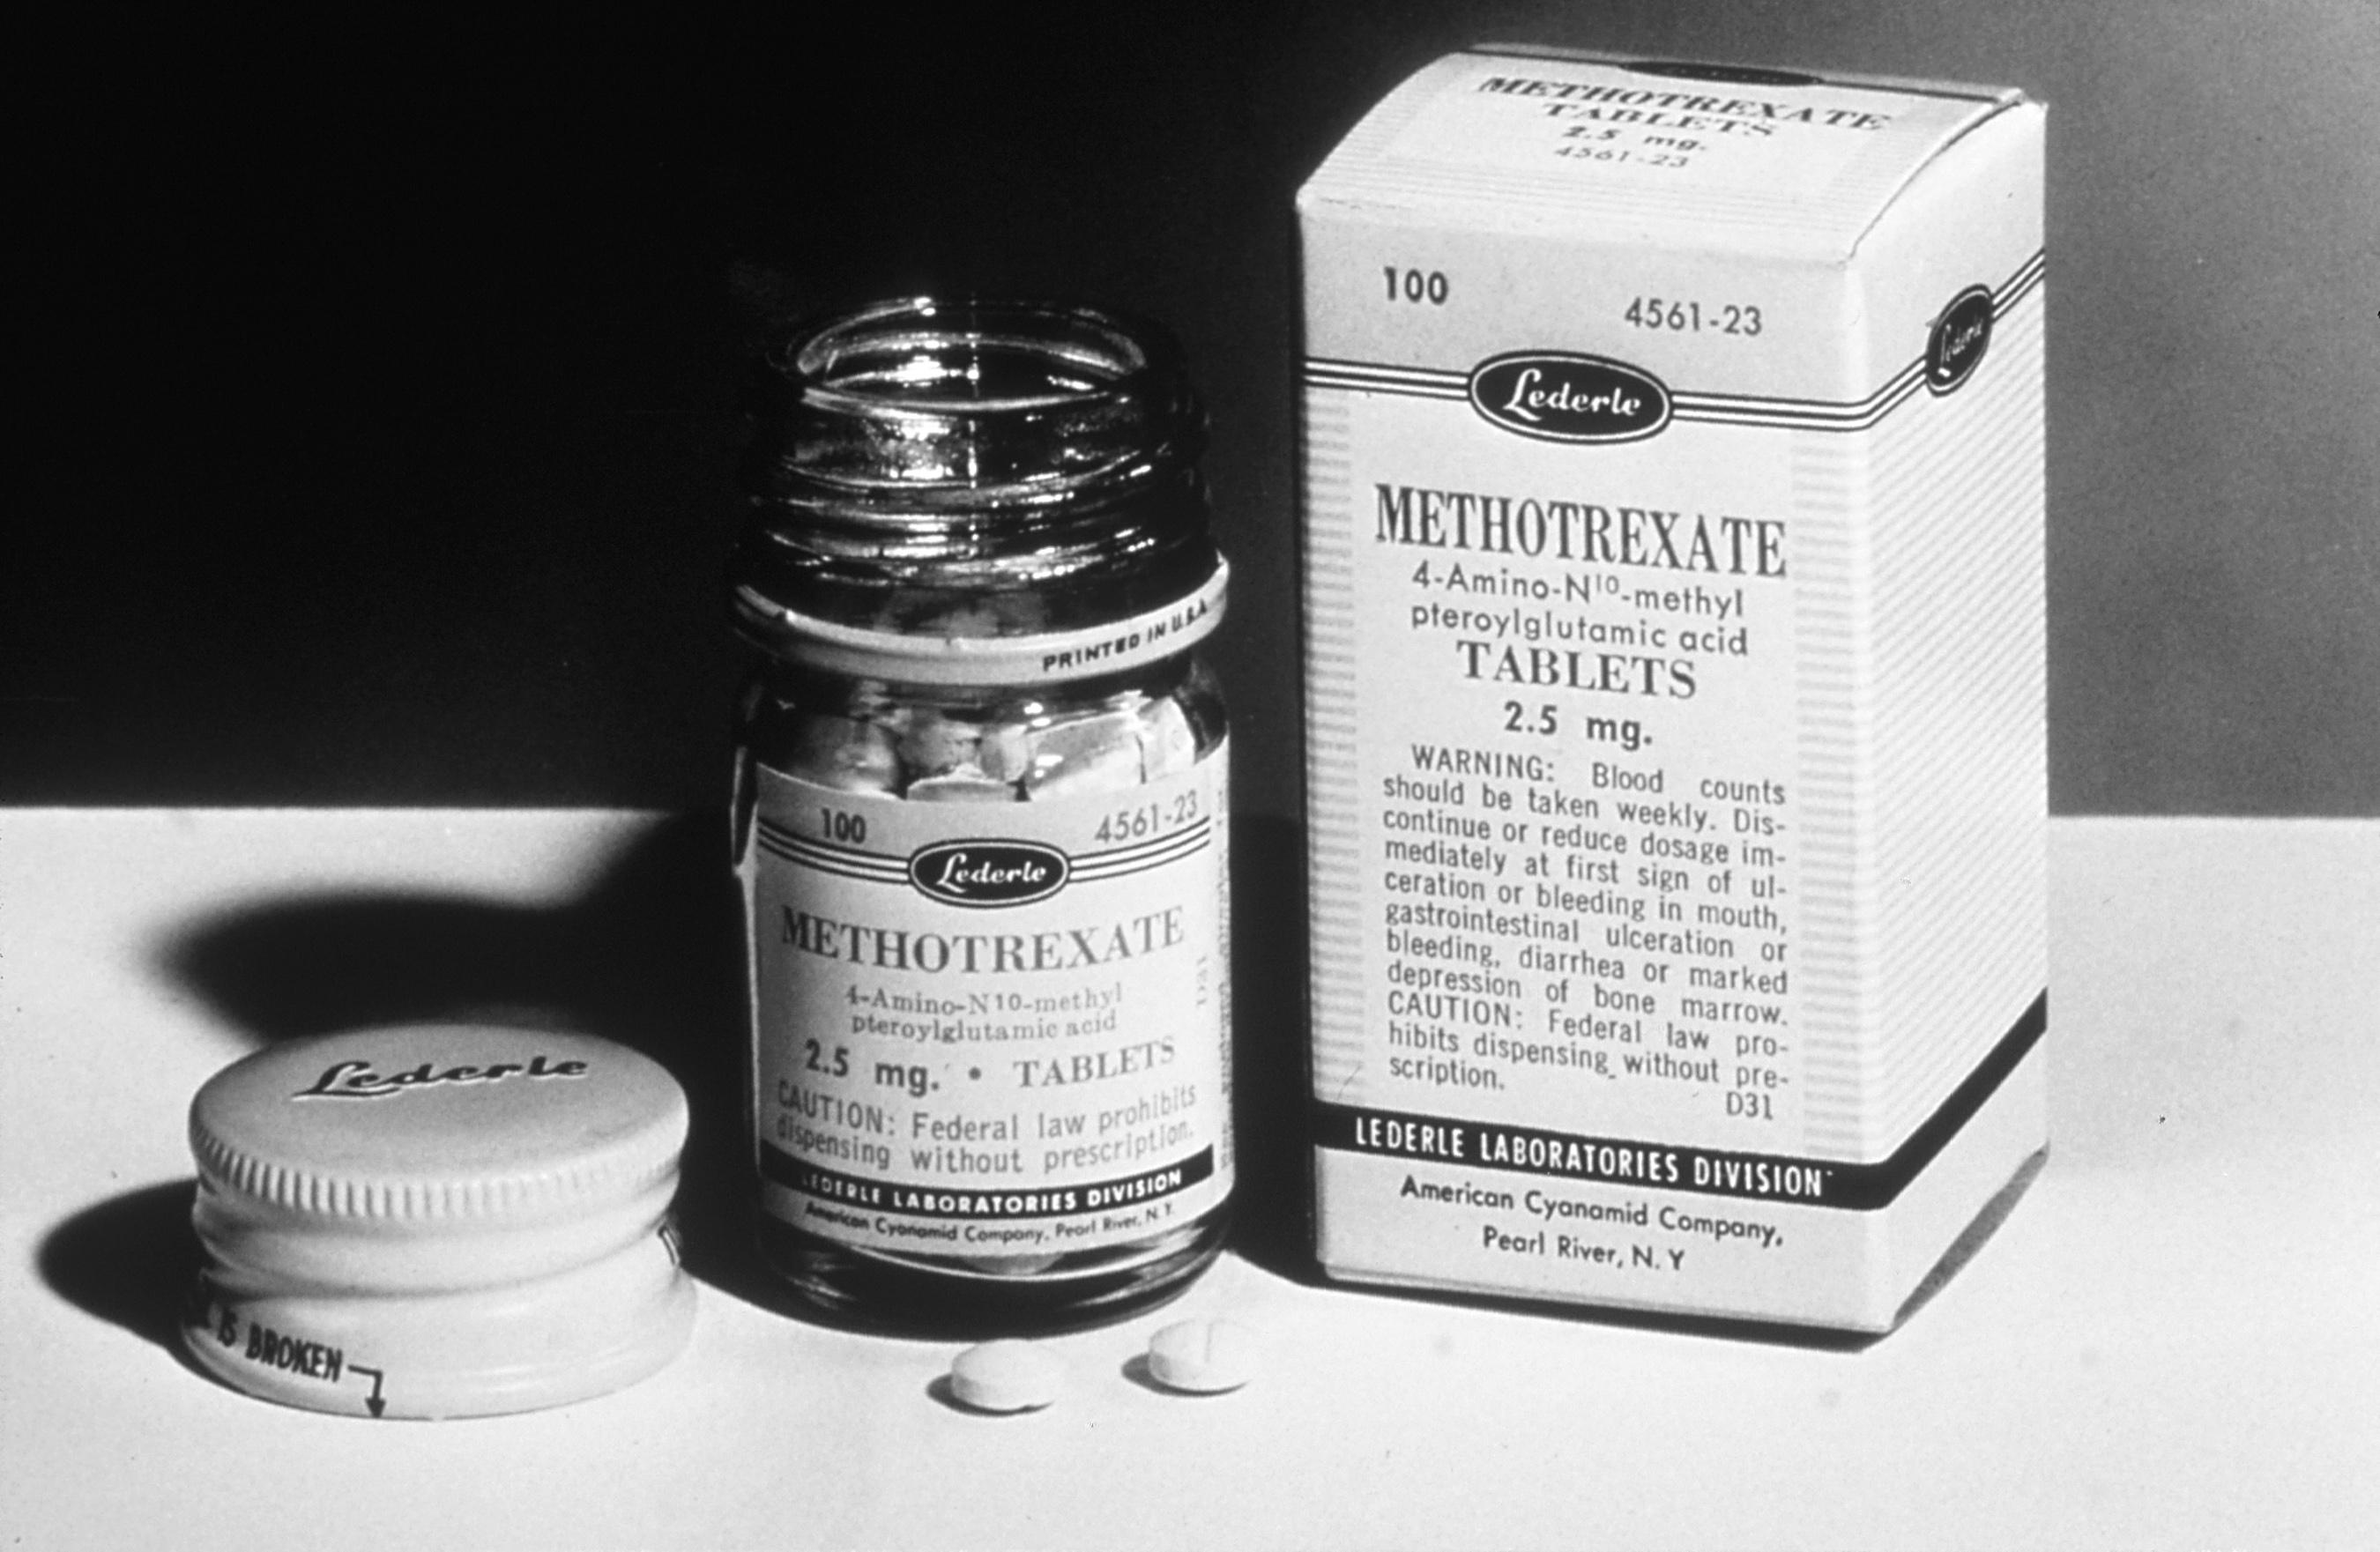 Methotrexate (Rheumatrex, Trexall)